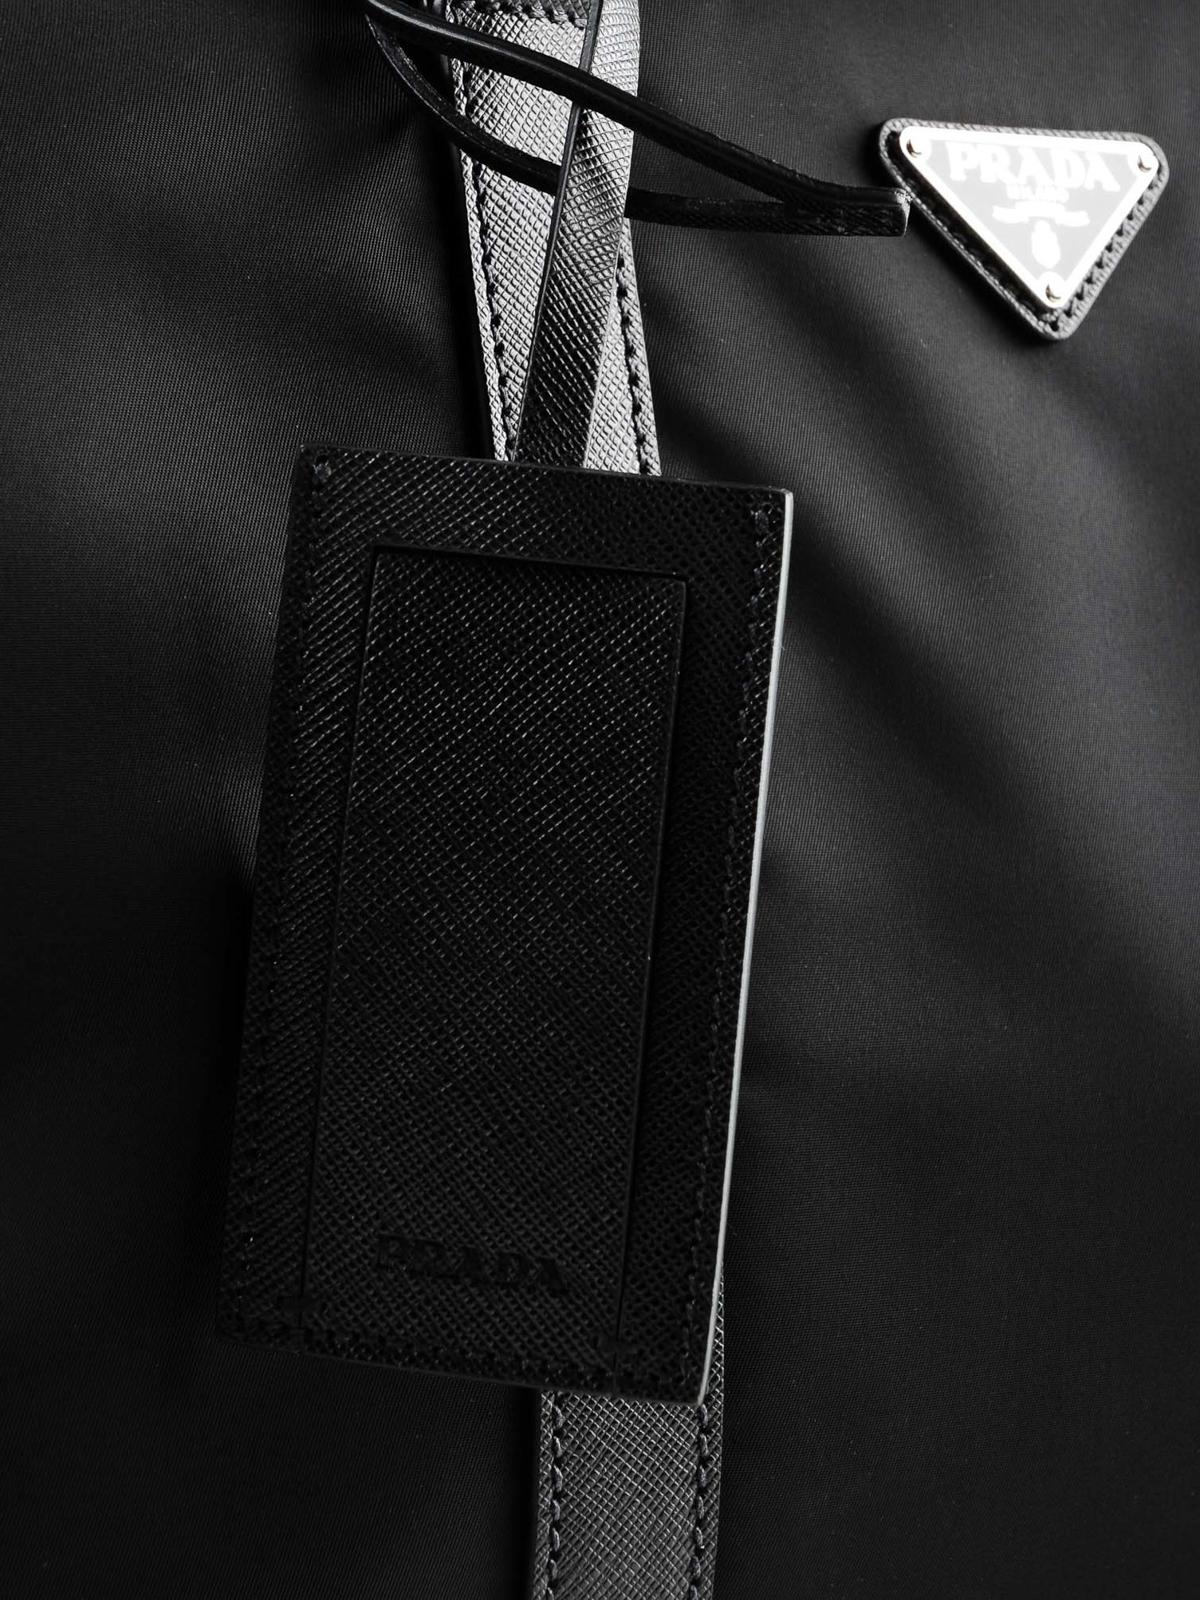 cf9b141027c9 Prada - Fabric travel duffle bag with leather details - Luggage ...